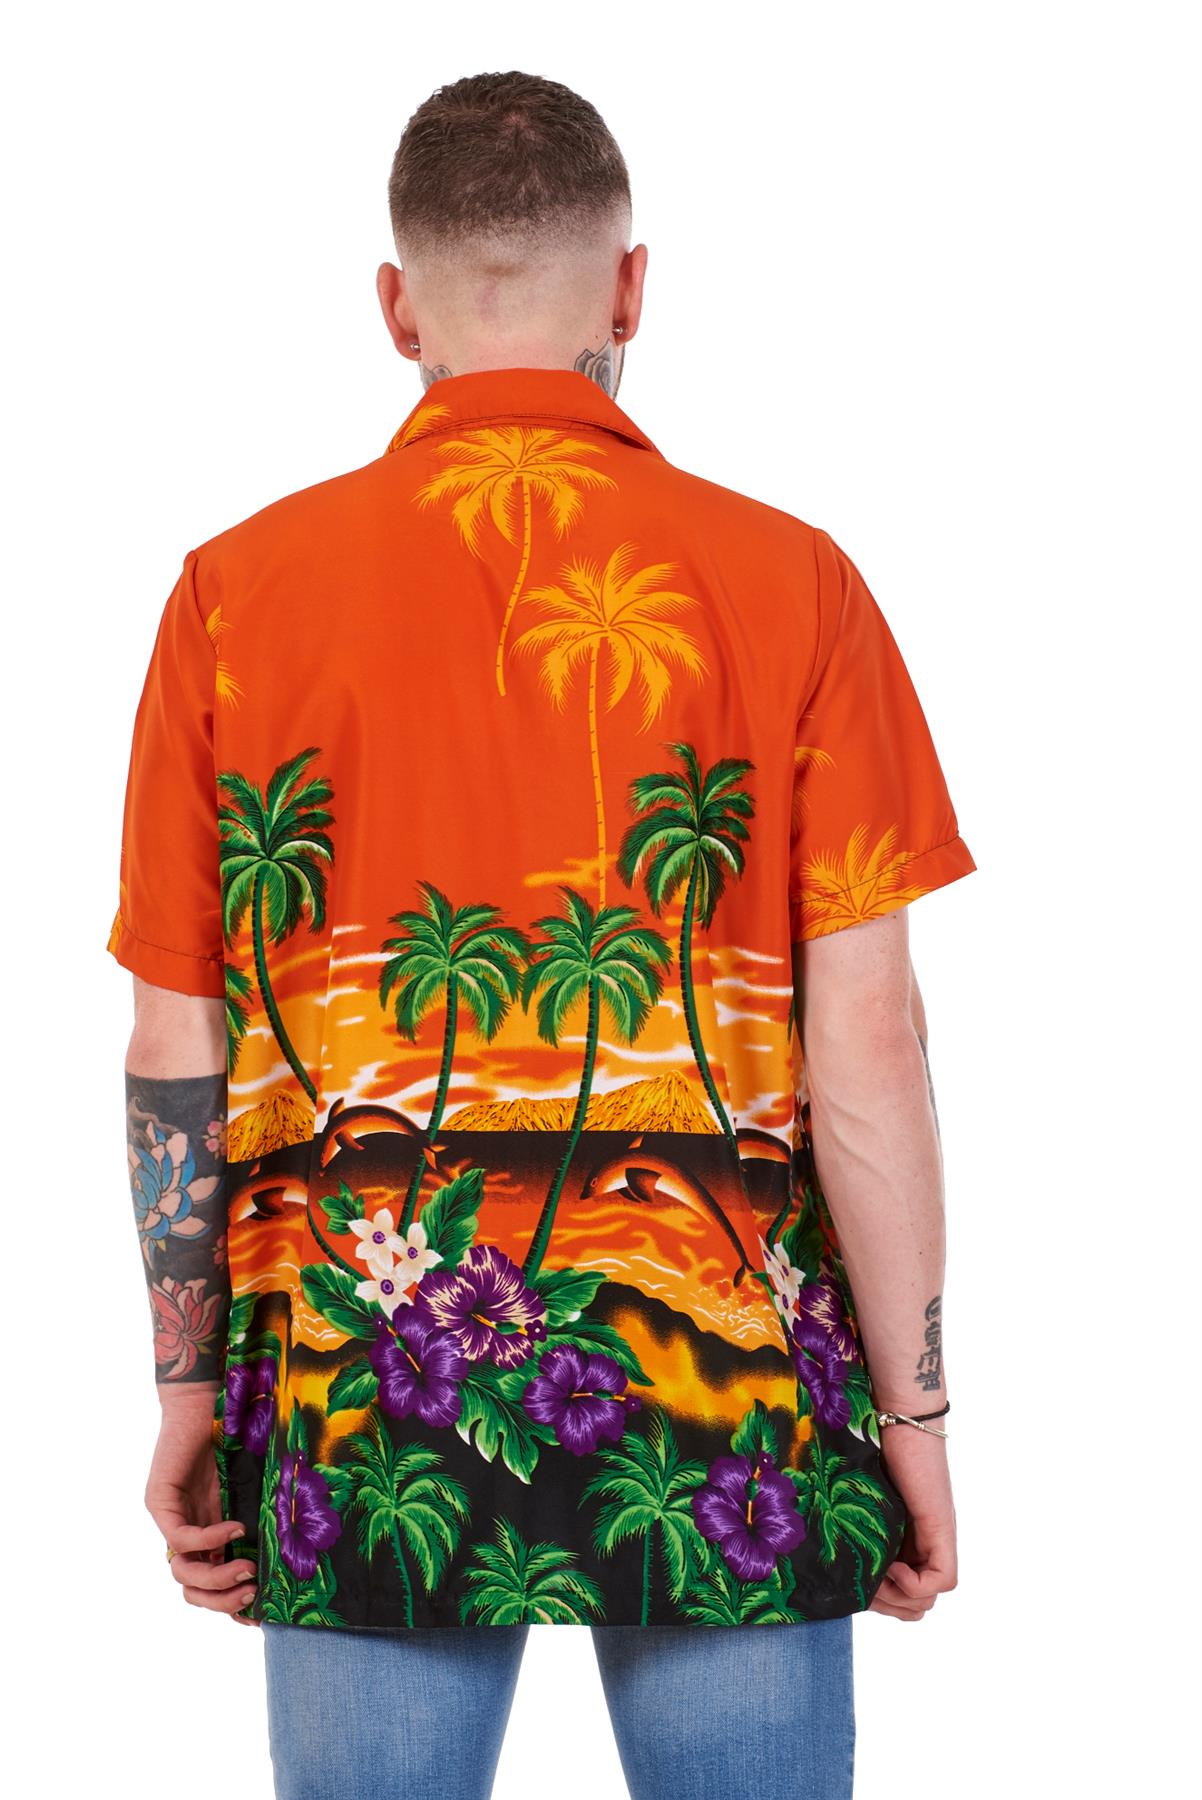 Mens-Hawaiian-Shirt-Multi-Colors-Print-Regular-Big-Size-Summer-Fancy-Dress-M-5XL thumbnail 24